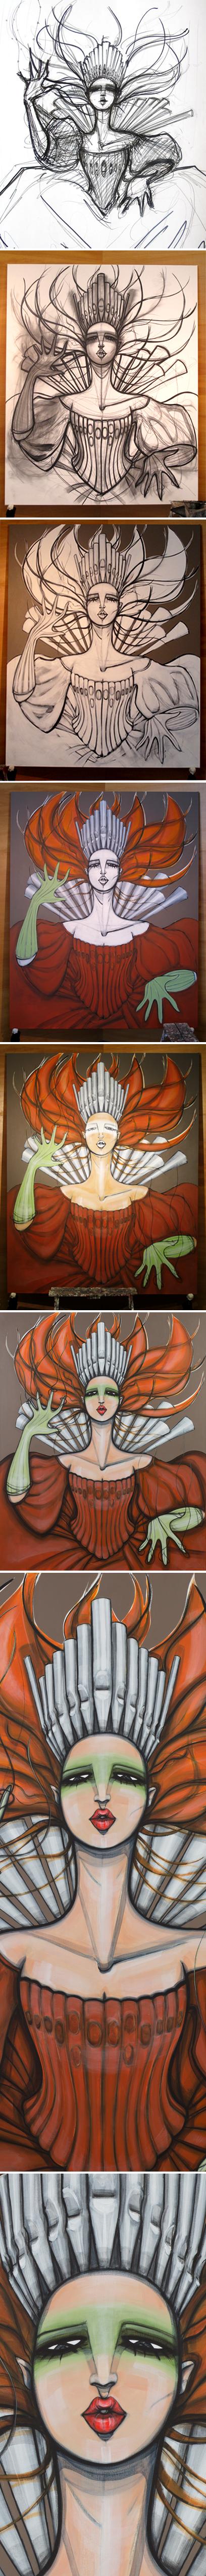 Organ-Queen-evolution